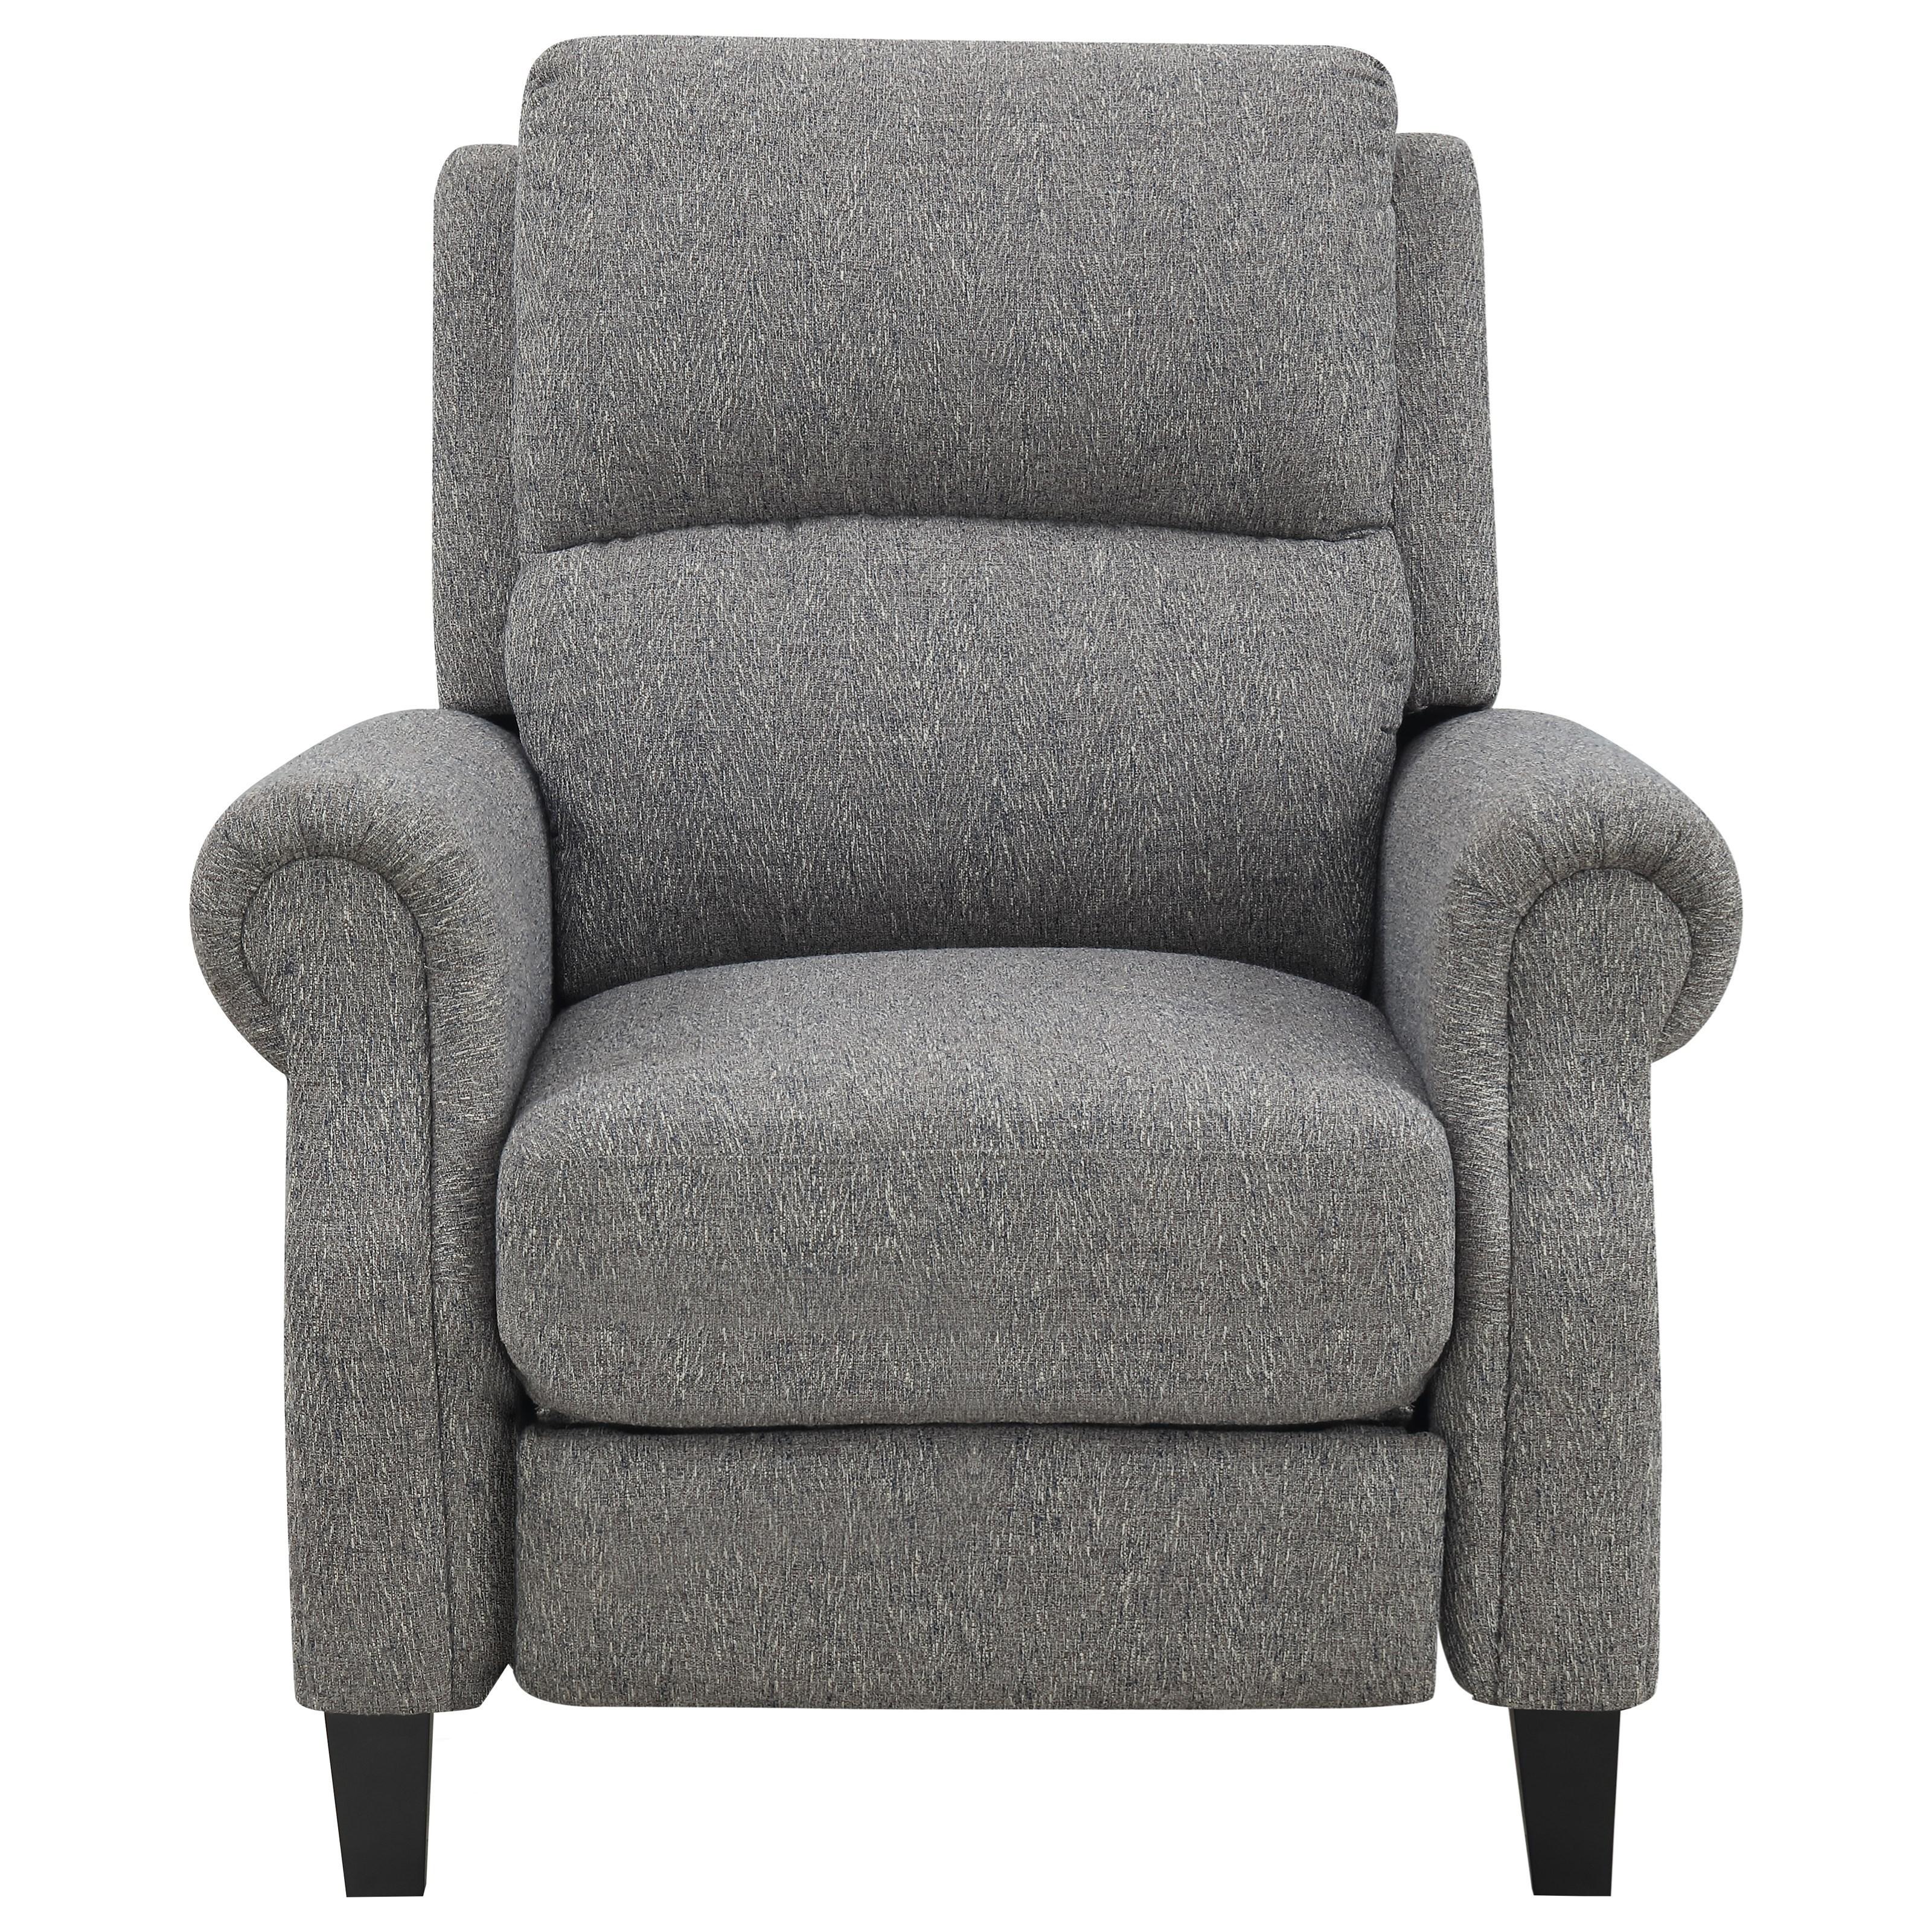 Torrey High Leg Reclining Chair by Emerald at Northeast Factory Direct